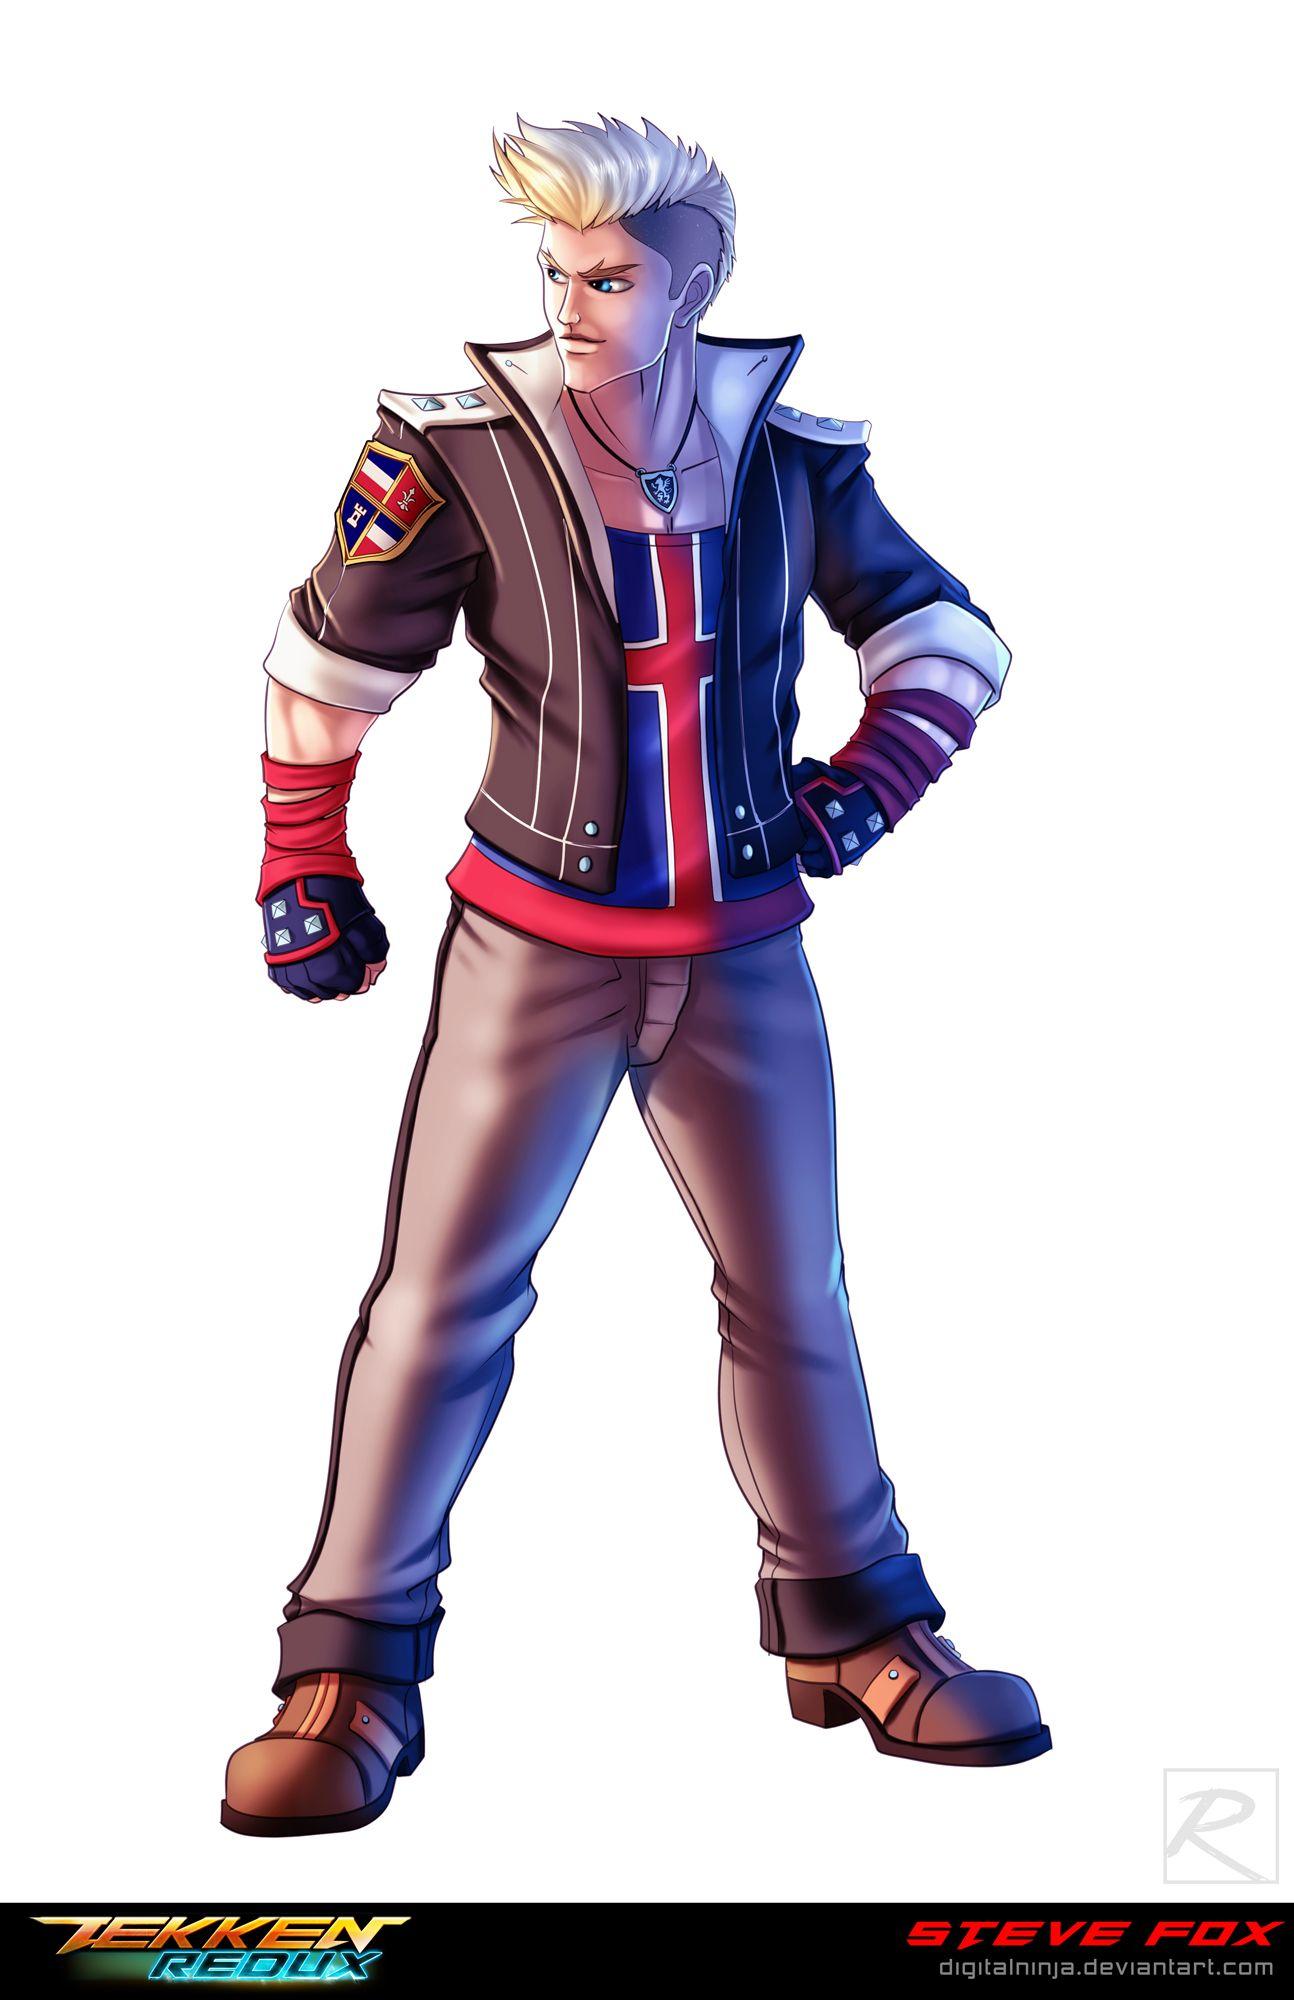 Tekken Redux Project Steve Fox Steve Character Creation My Arts